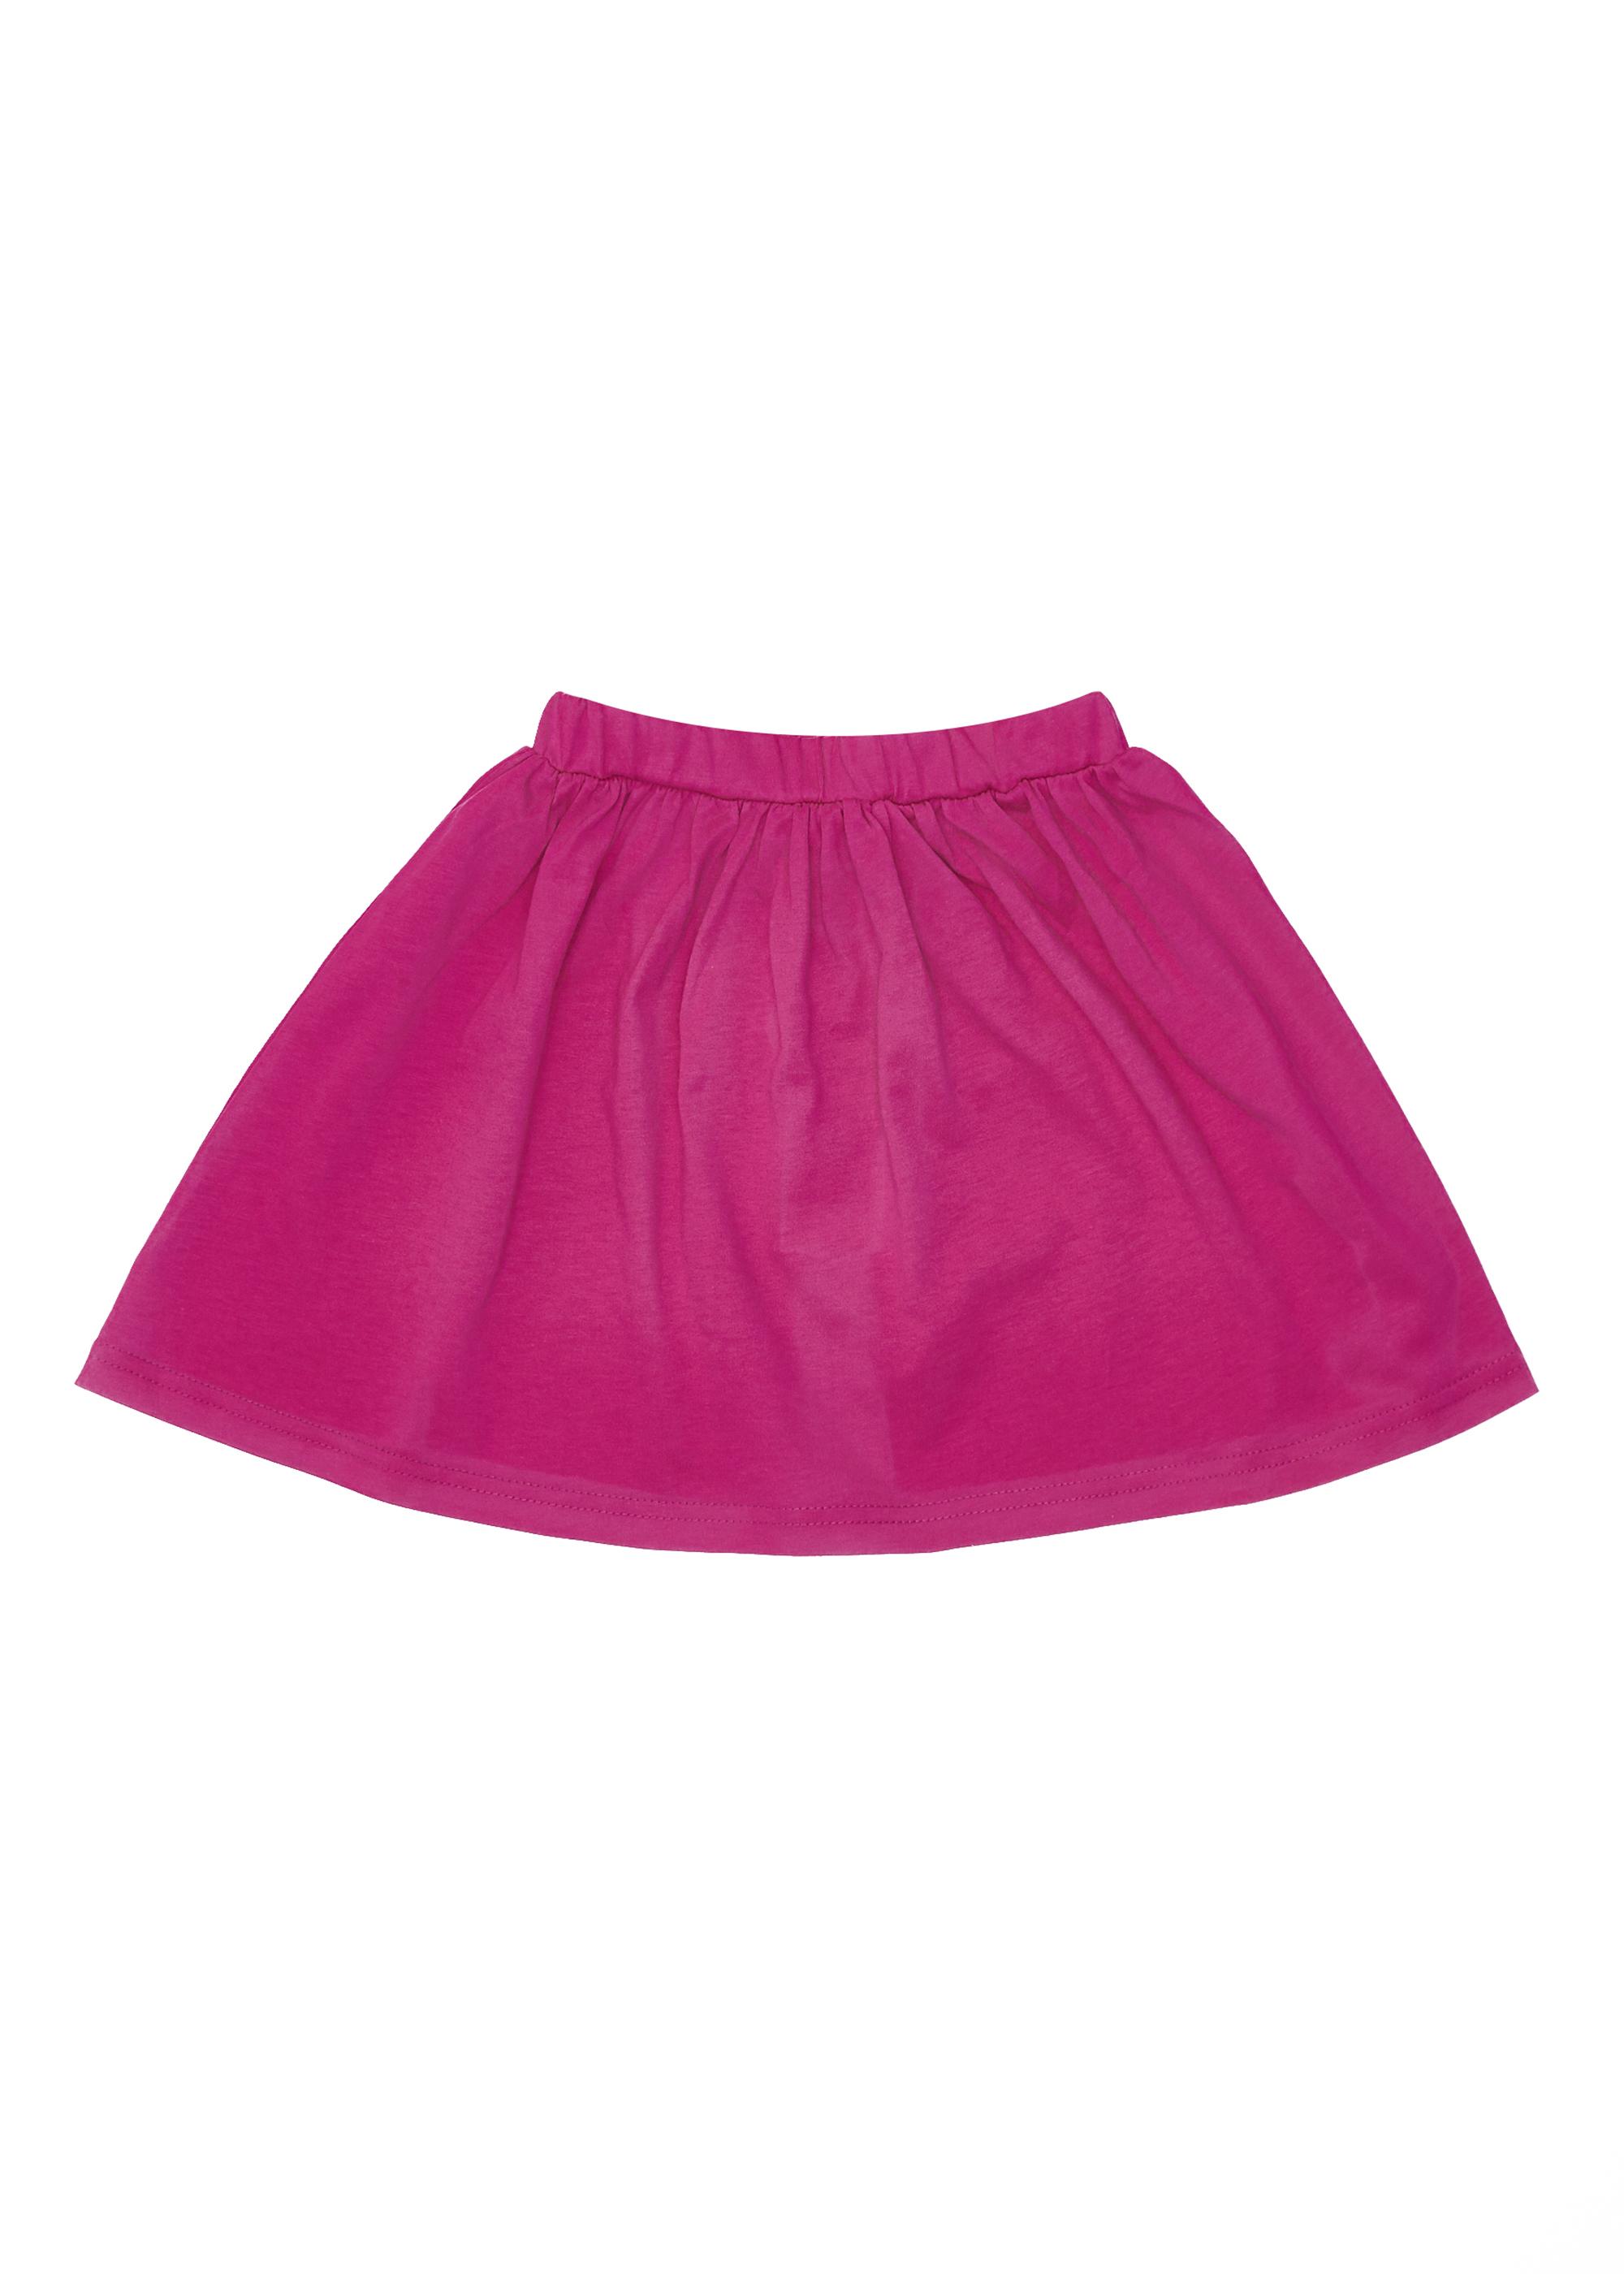 Dívčí sukně Paris - fuchsia Fuchsie, Navy/Bílá